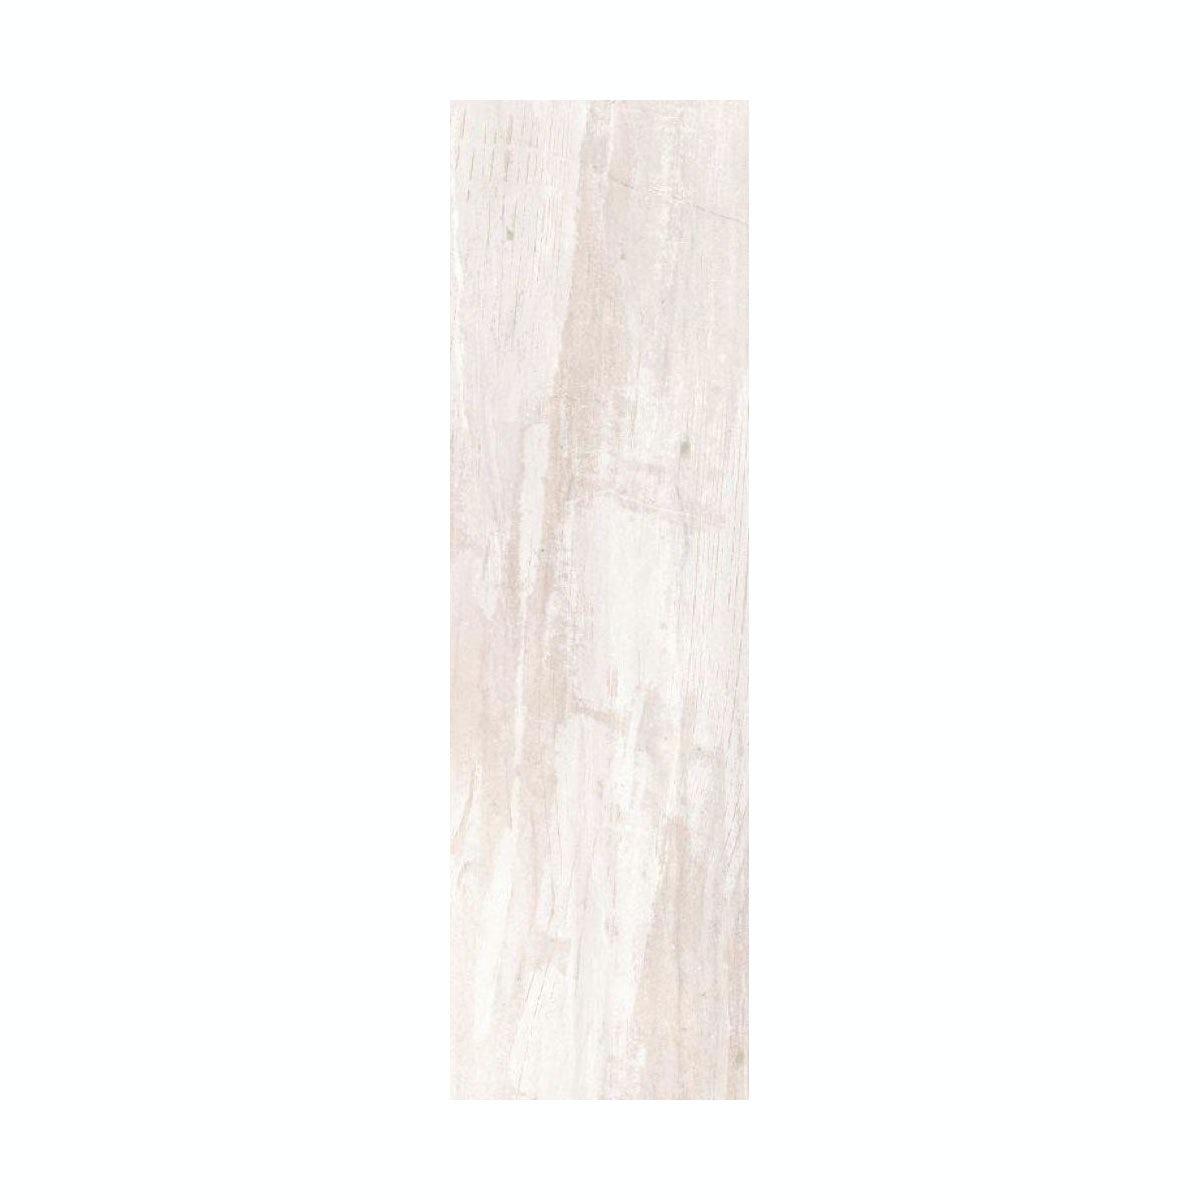 British ceramic tile bark white wood effect white matt tile 148mm british ceramic tile bark white wood effect white matt tile 148mm x 498mm doublecrazyfo Images